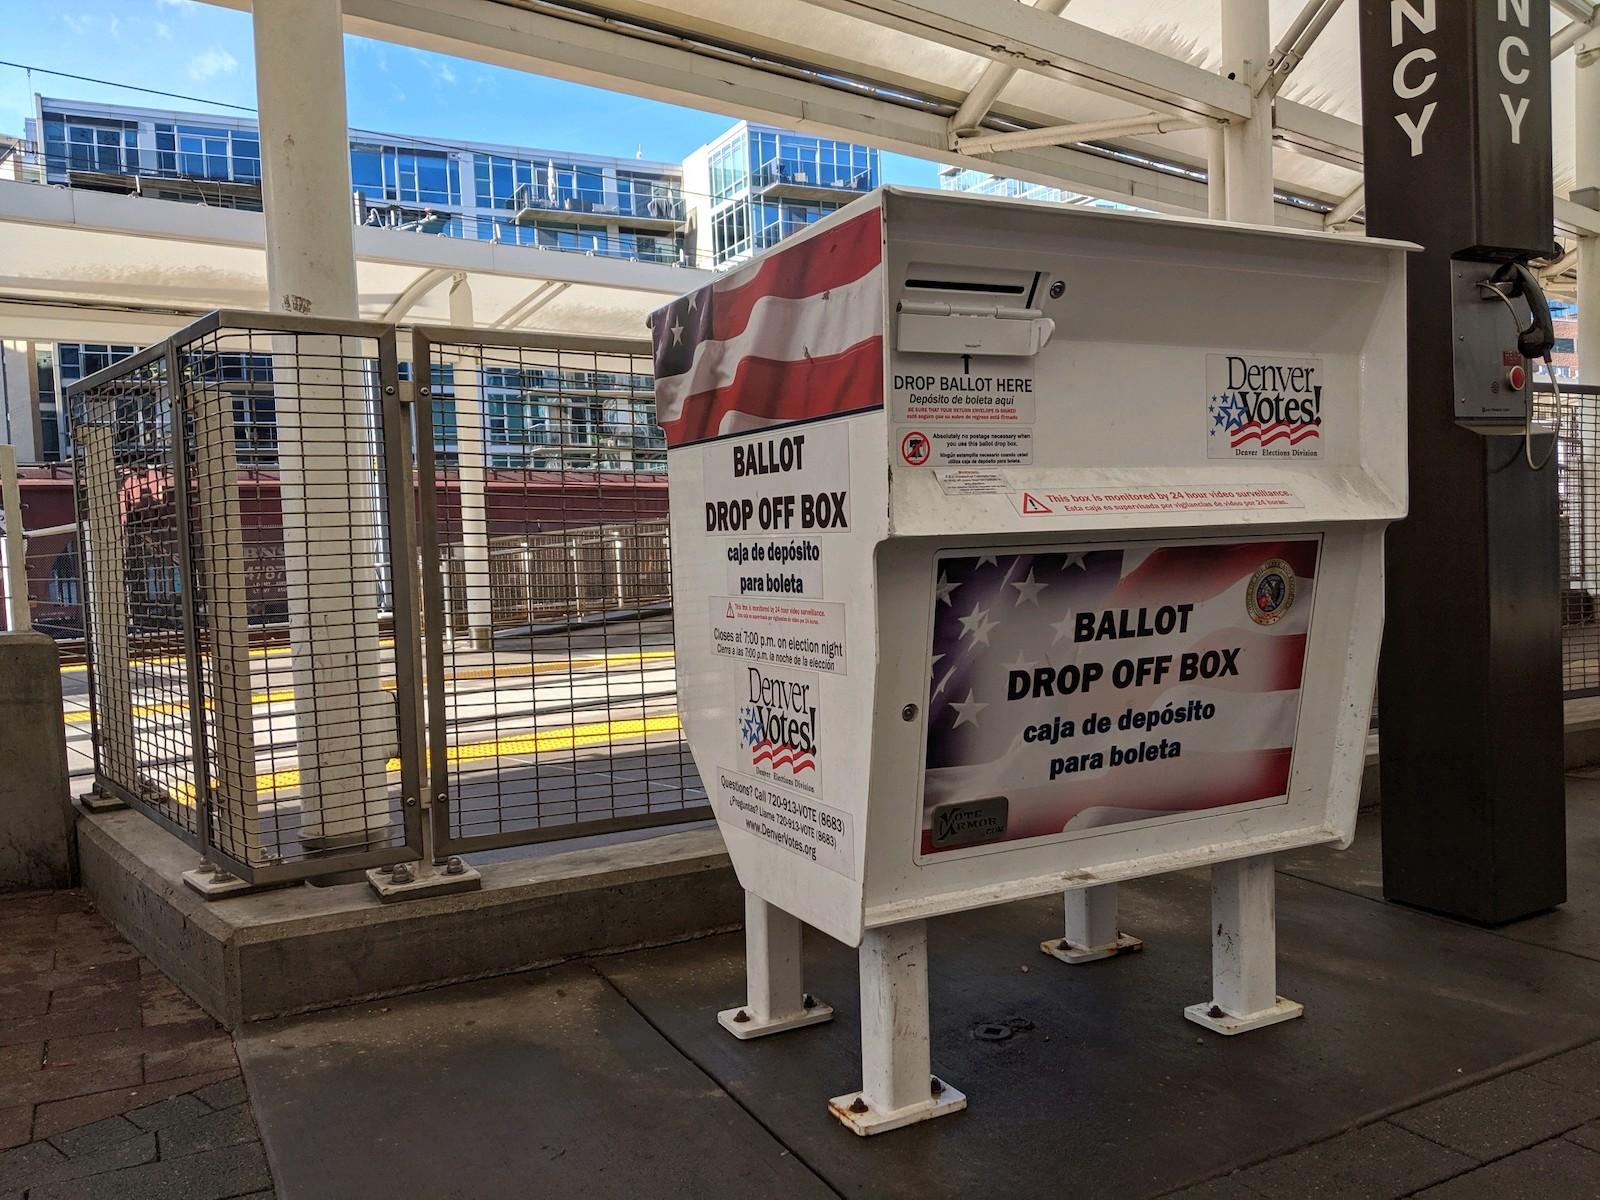 Denver Election 2019 Results: Prop CC Fails, School Board